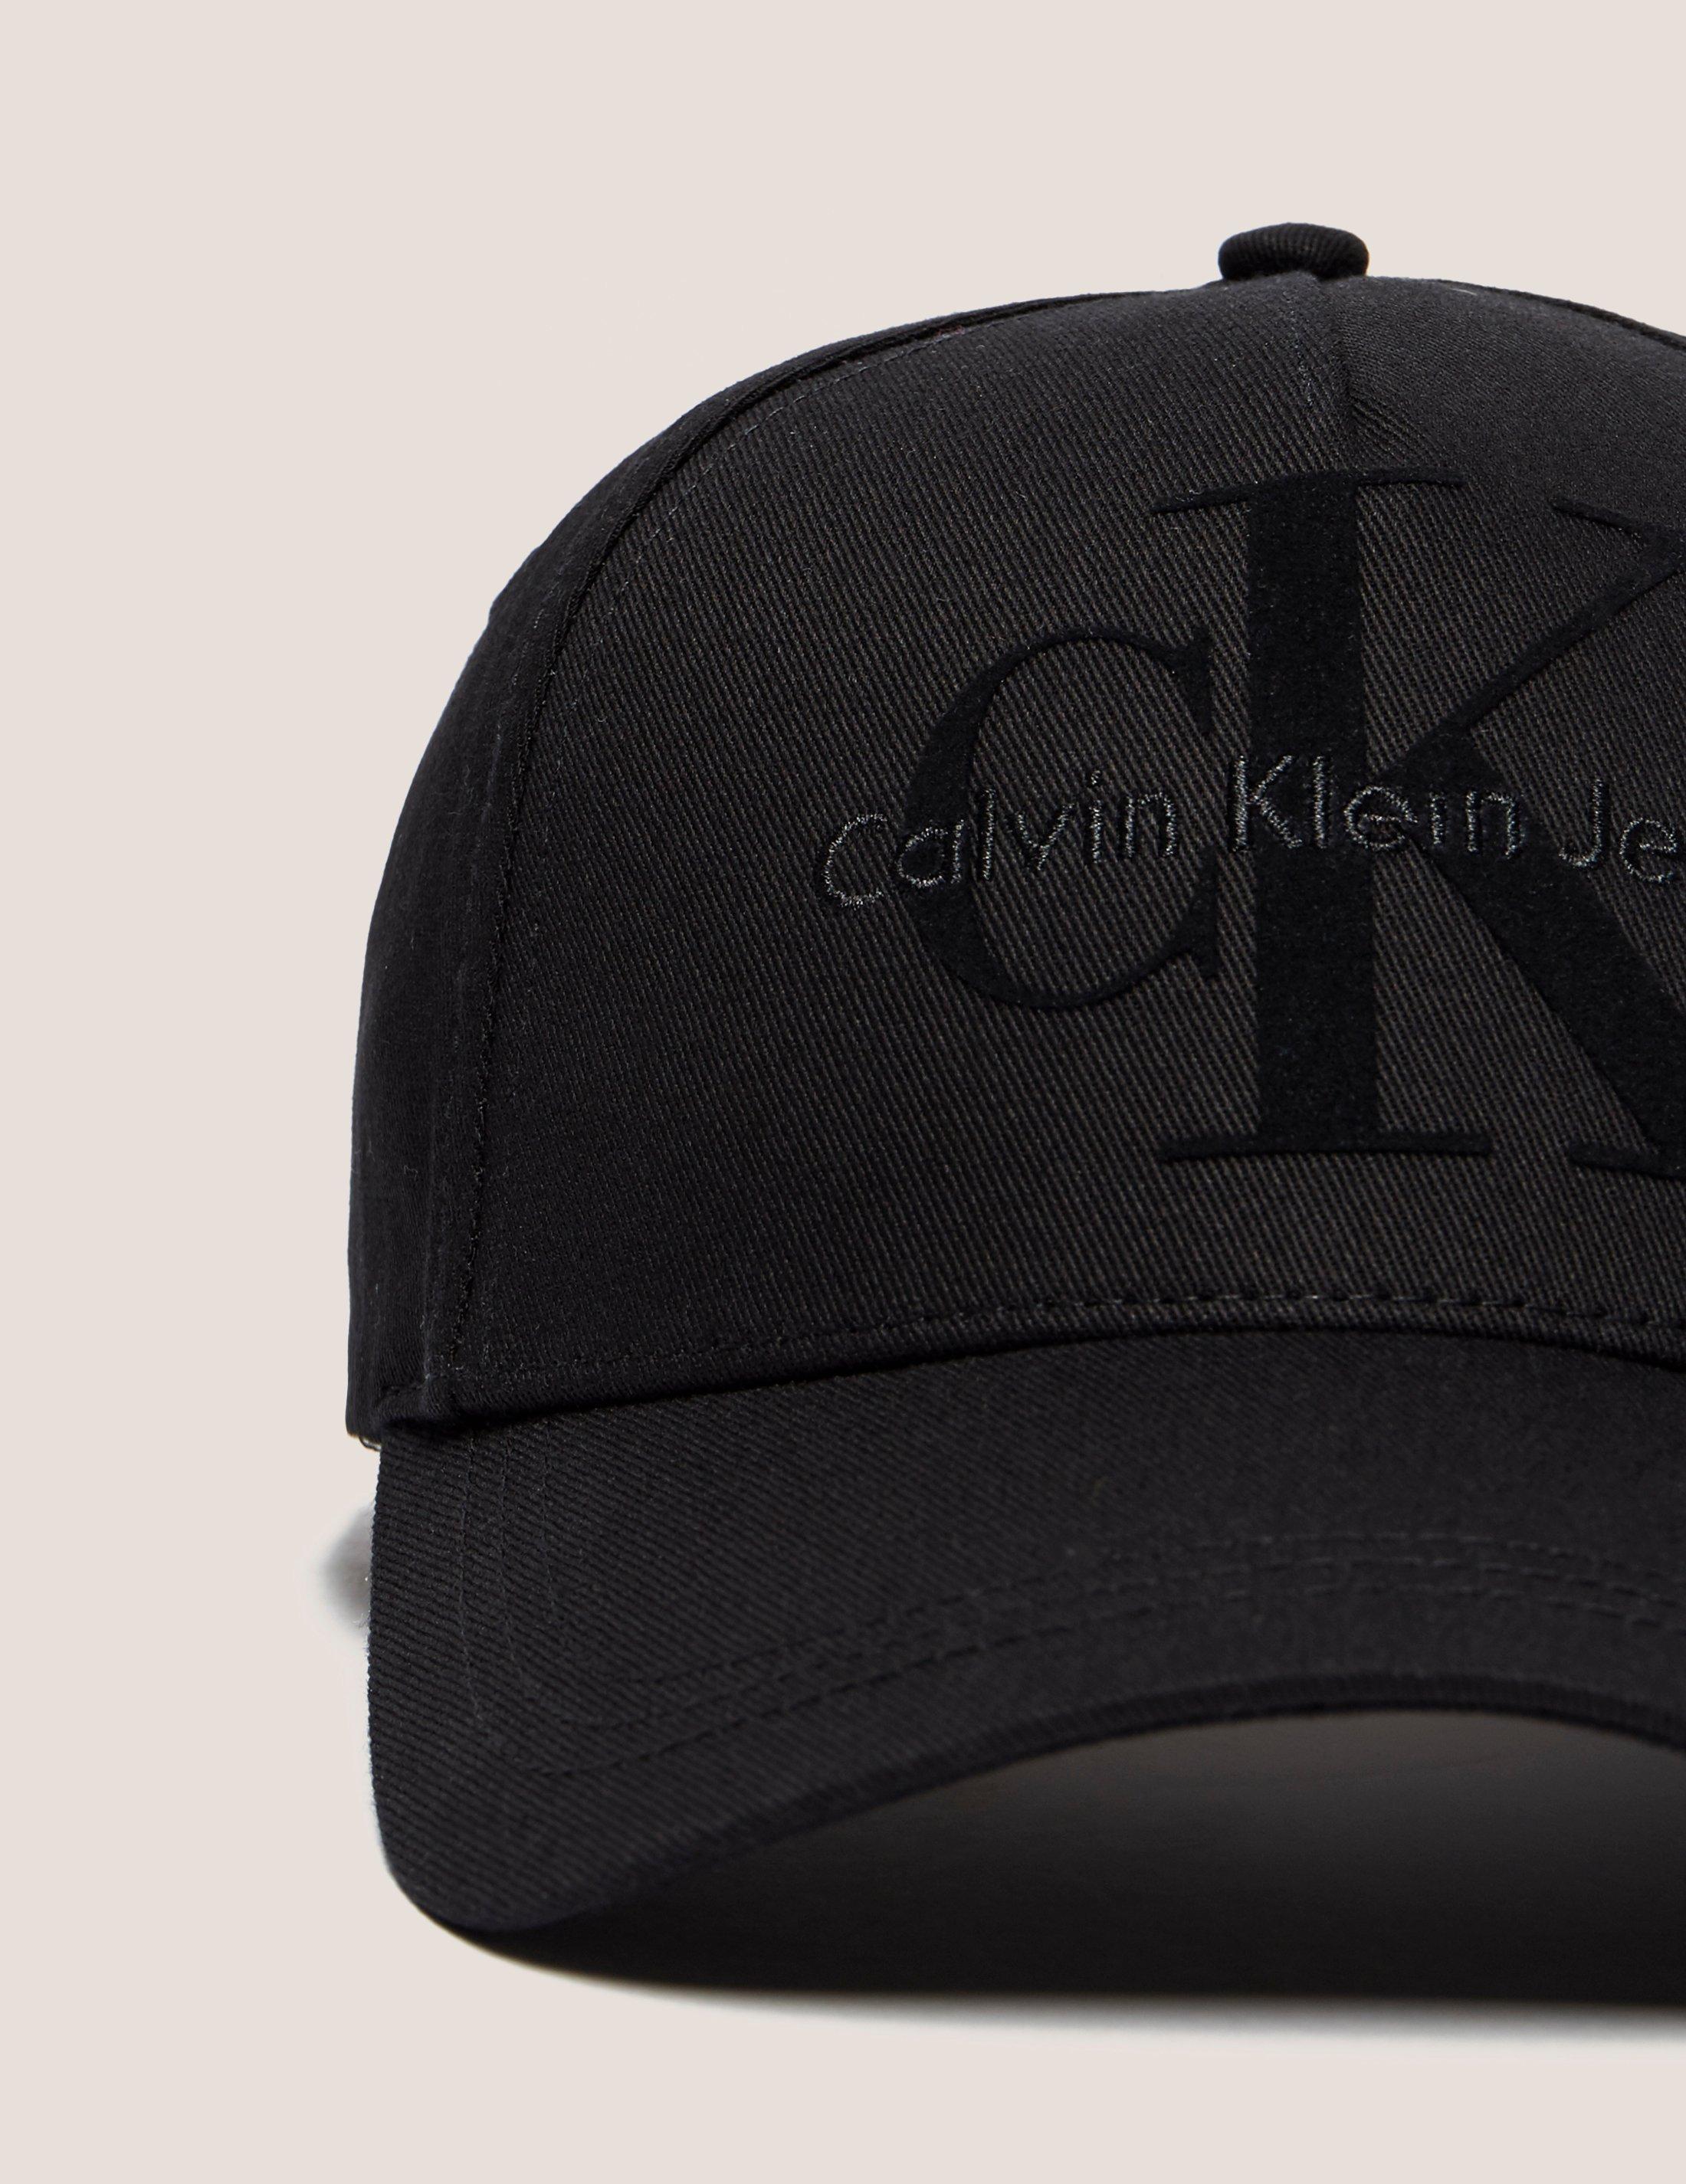 ee23382c765 ... new concept e3d9a 4b485 Lyst - Calvin Klein 205W39Nyc Mens Re-issue  Baseball Cap Bla ...